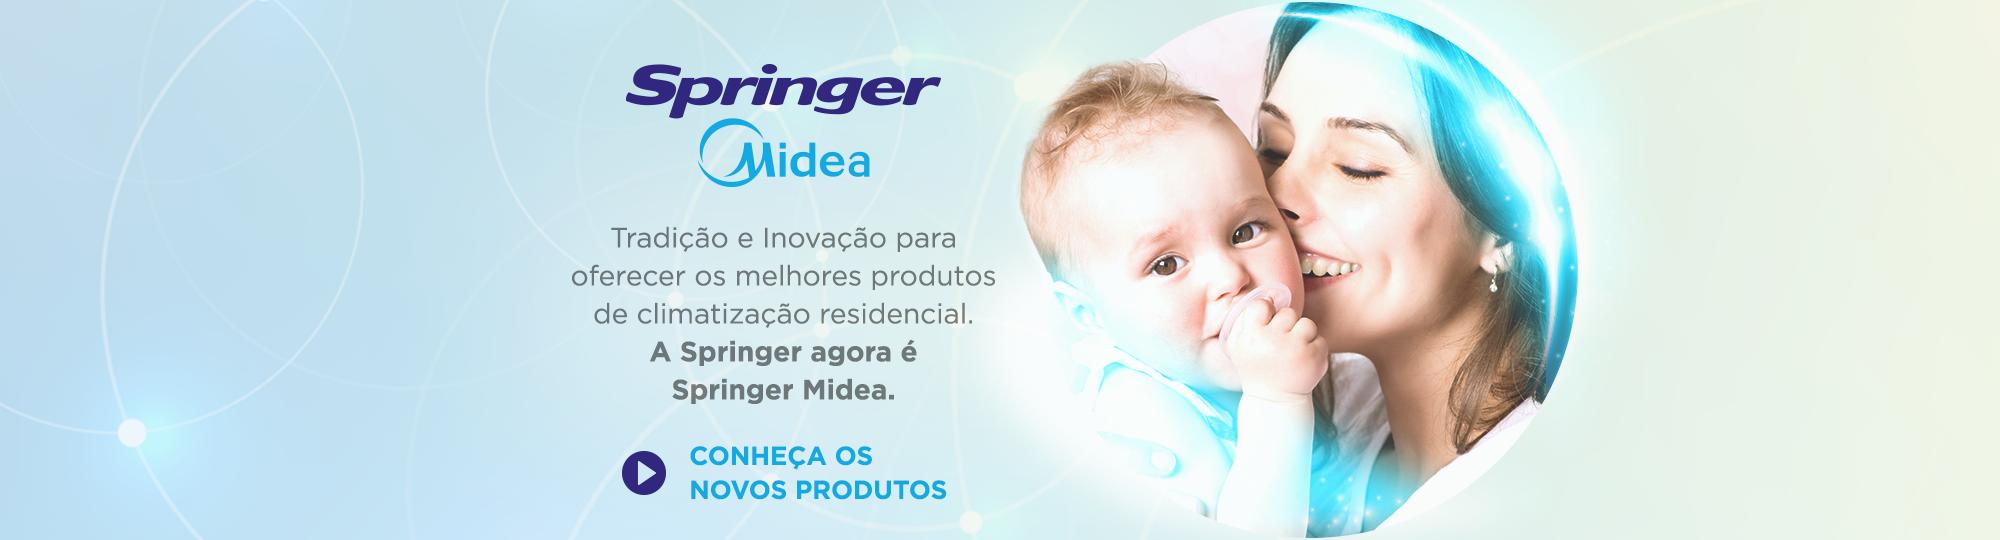 Springer Midea